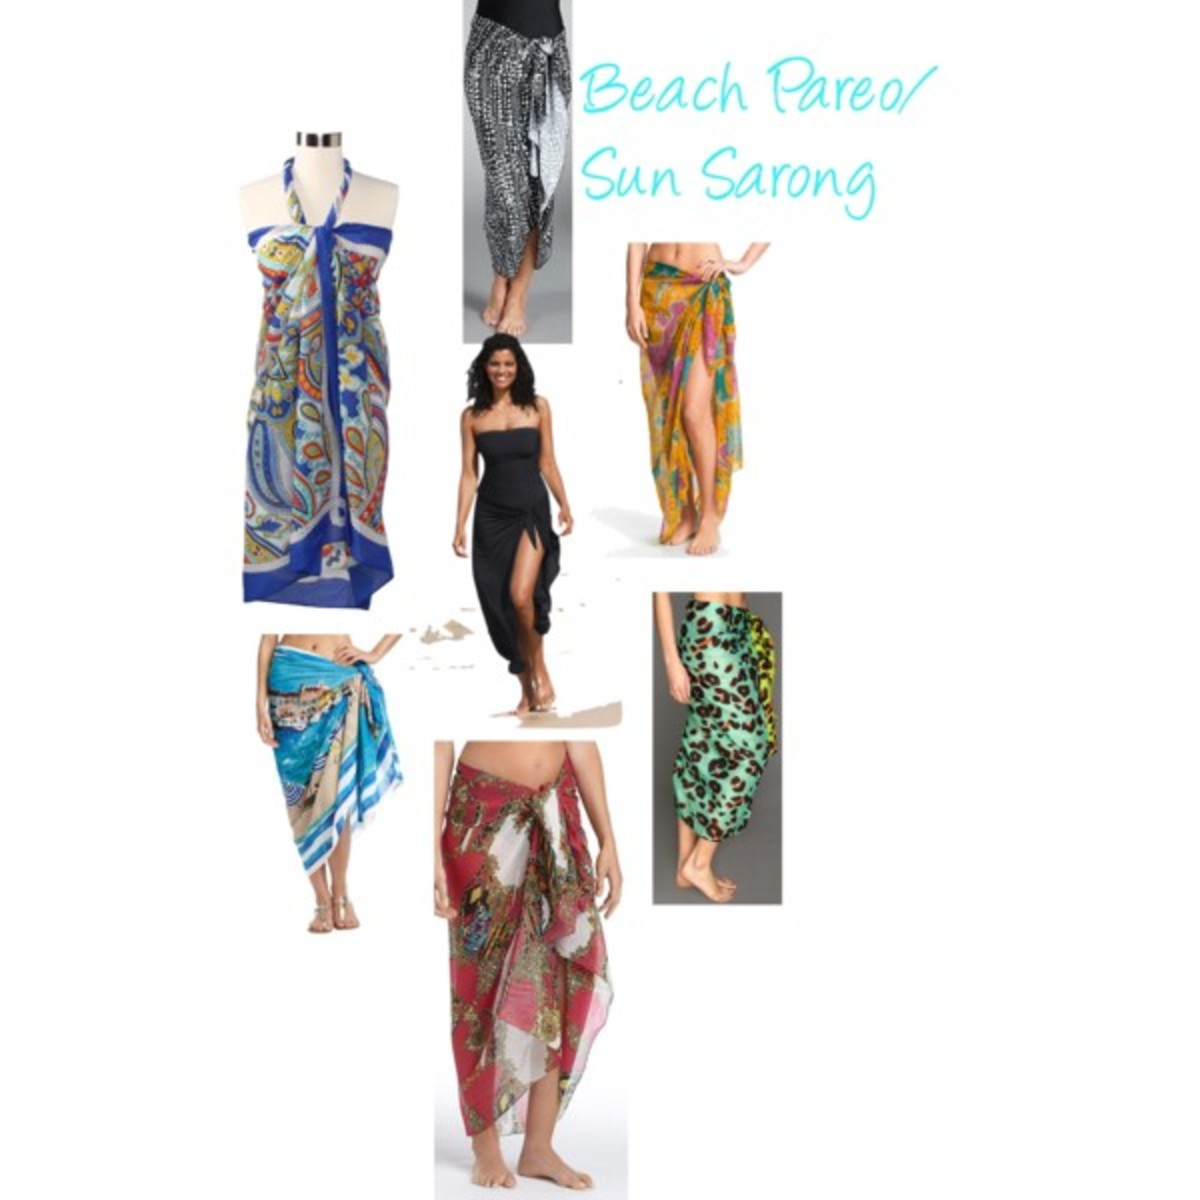 beach pareo.sun sarong